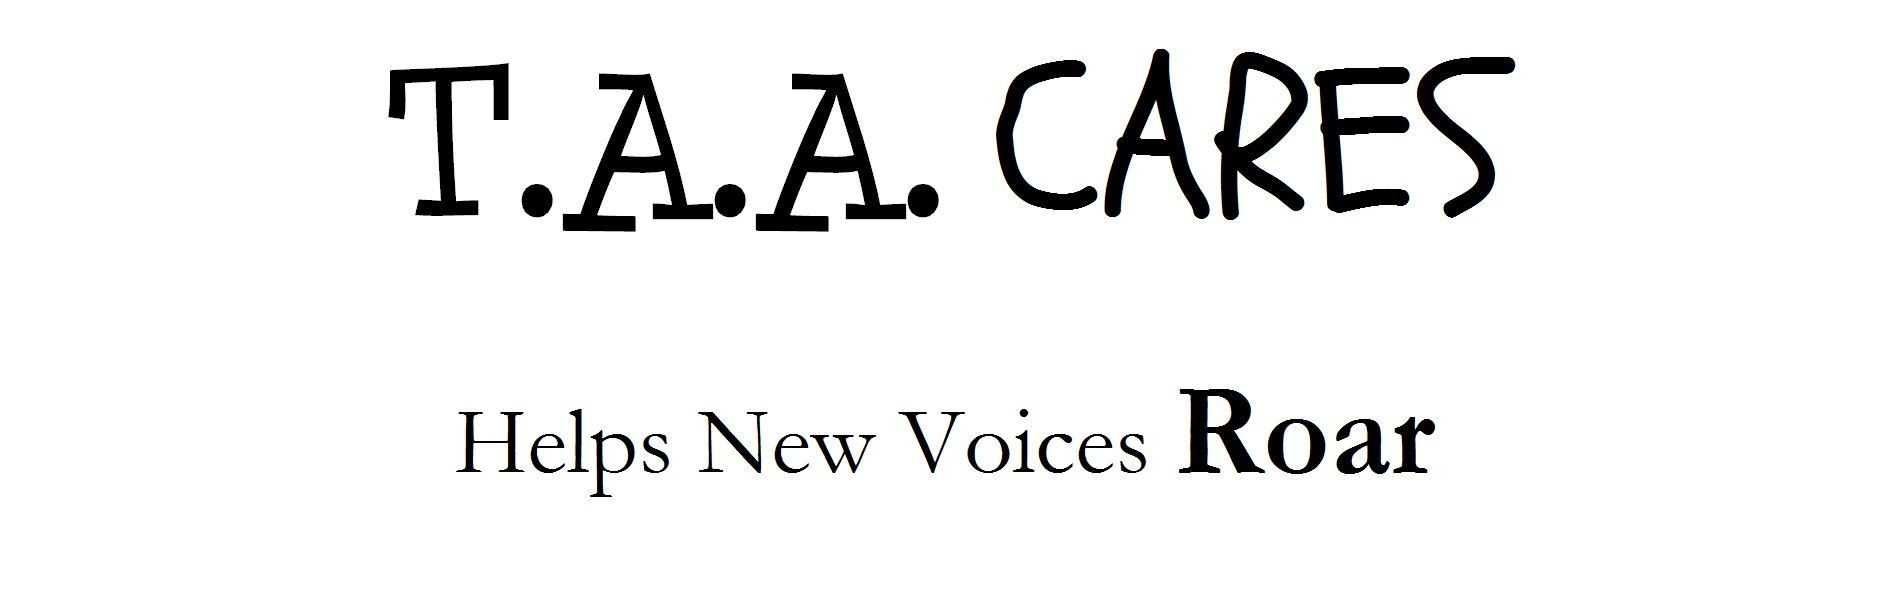 TAA_CARES 2